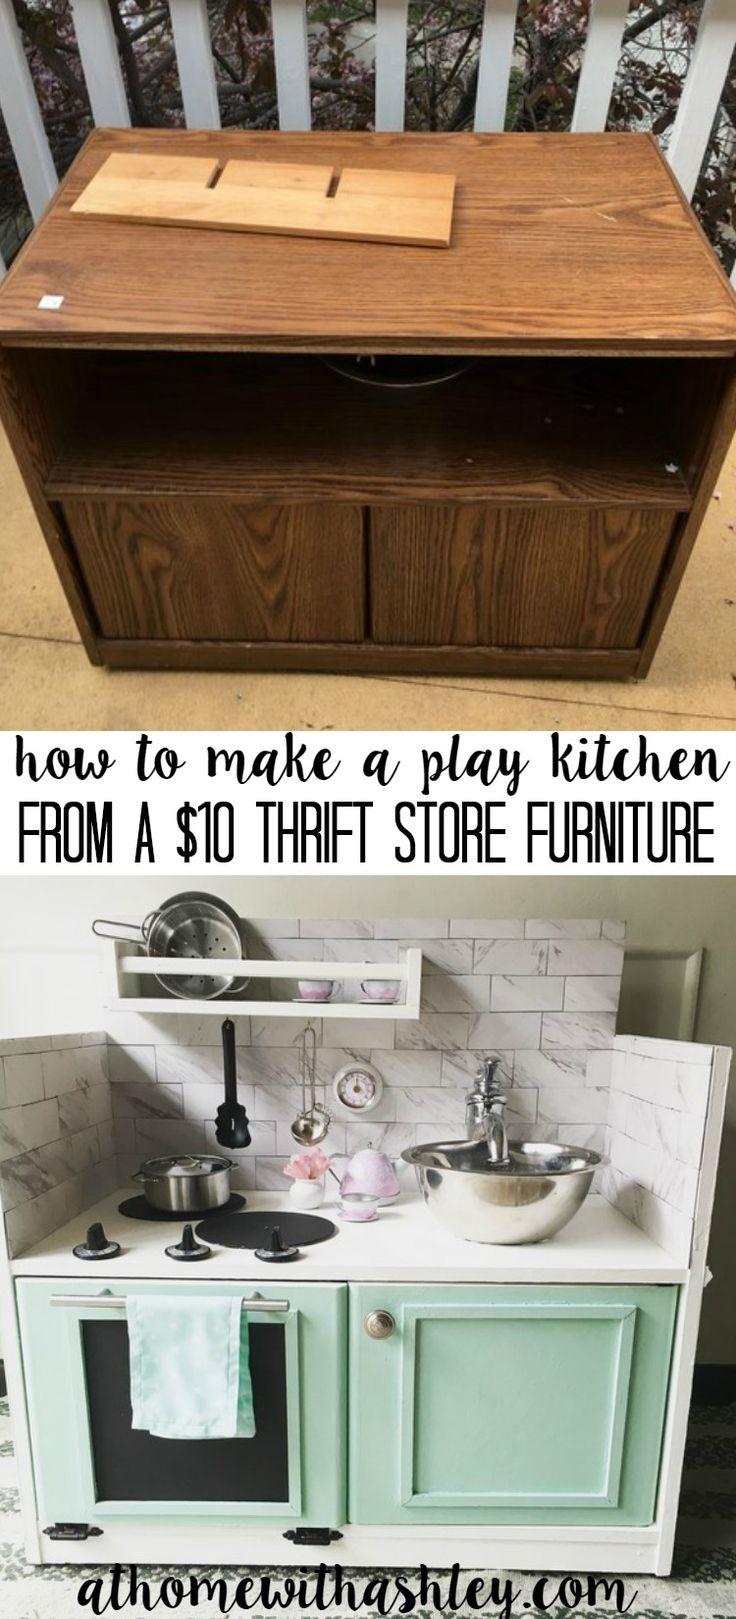 best kids stuff images on pinterest play kitchens kid kitchen